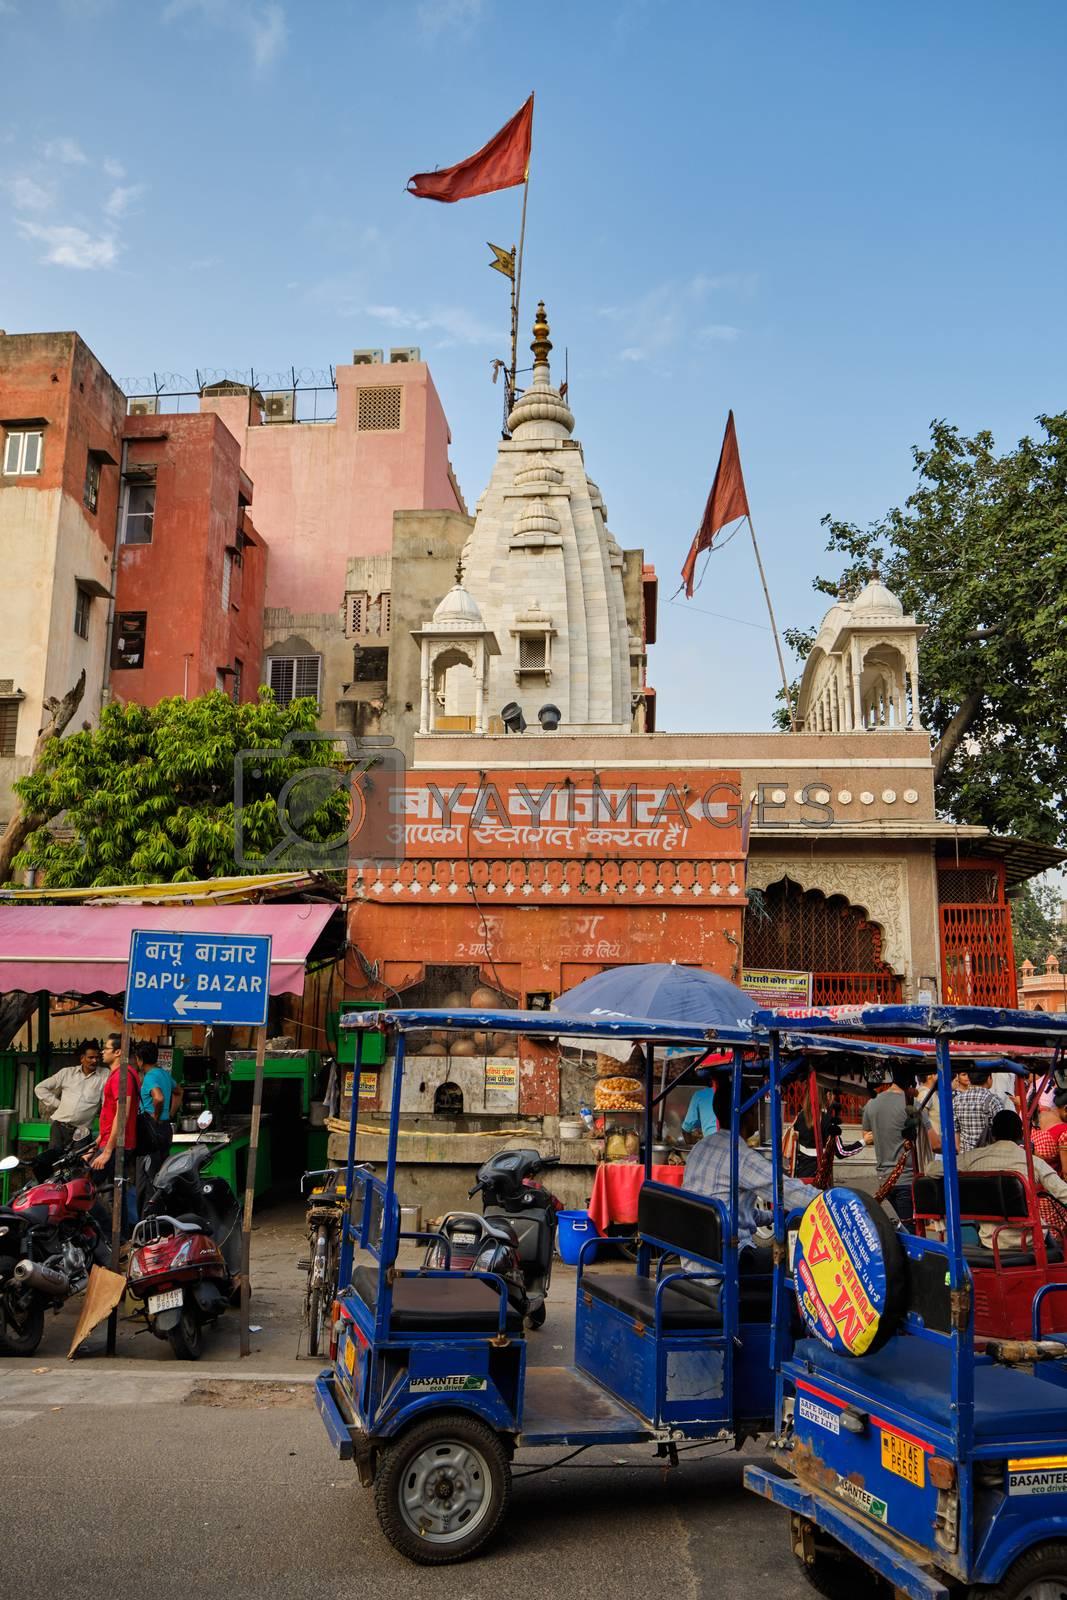 Jaipur, Rajasthan / India - September 28, 2019: Mandir Shri Hanuman Ji Hindu temple near the Chandpole Gate of the walled city of Jaipur, India